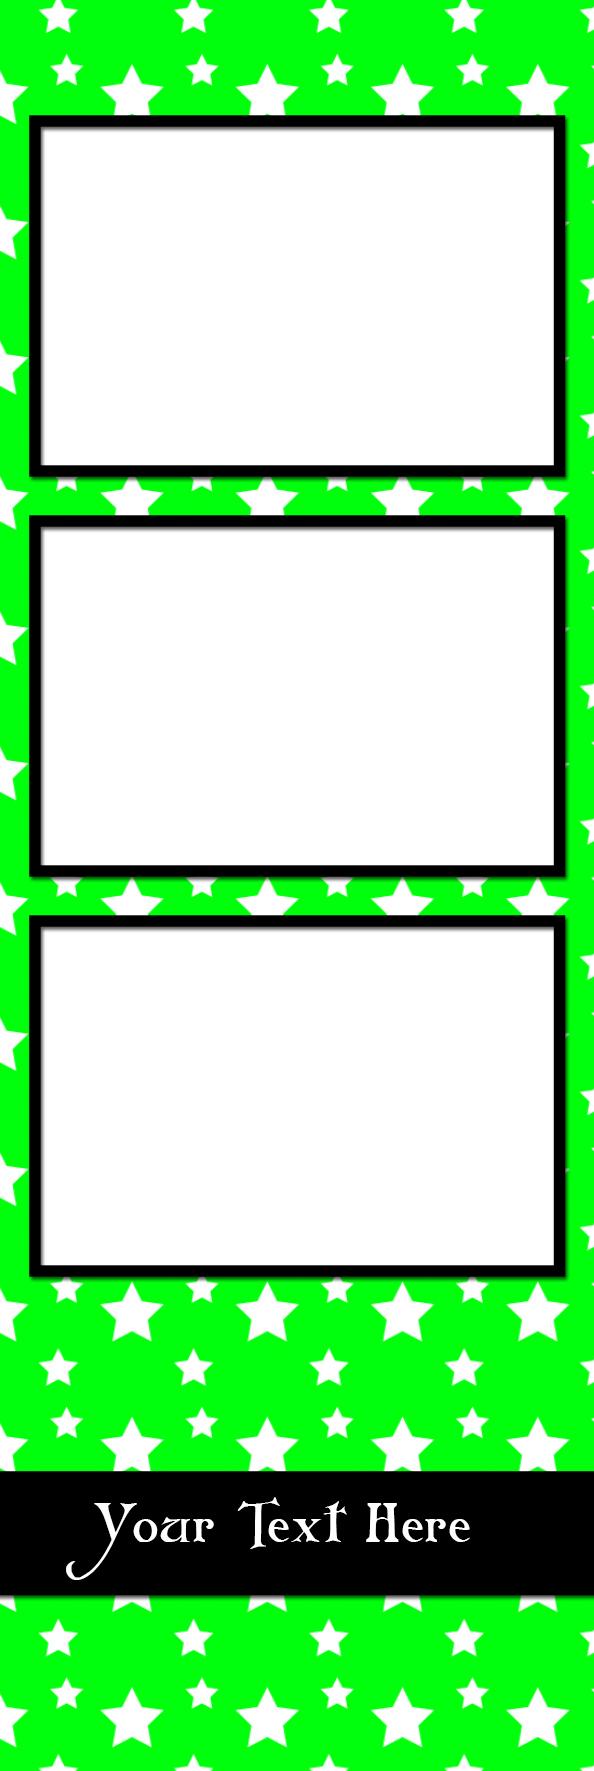 Texture_Stars-V-6P6.jpg